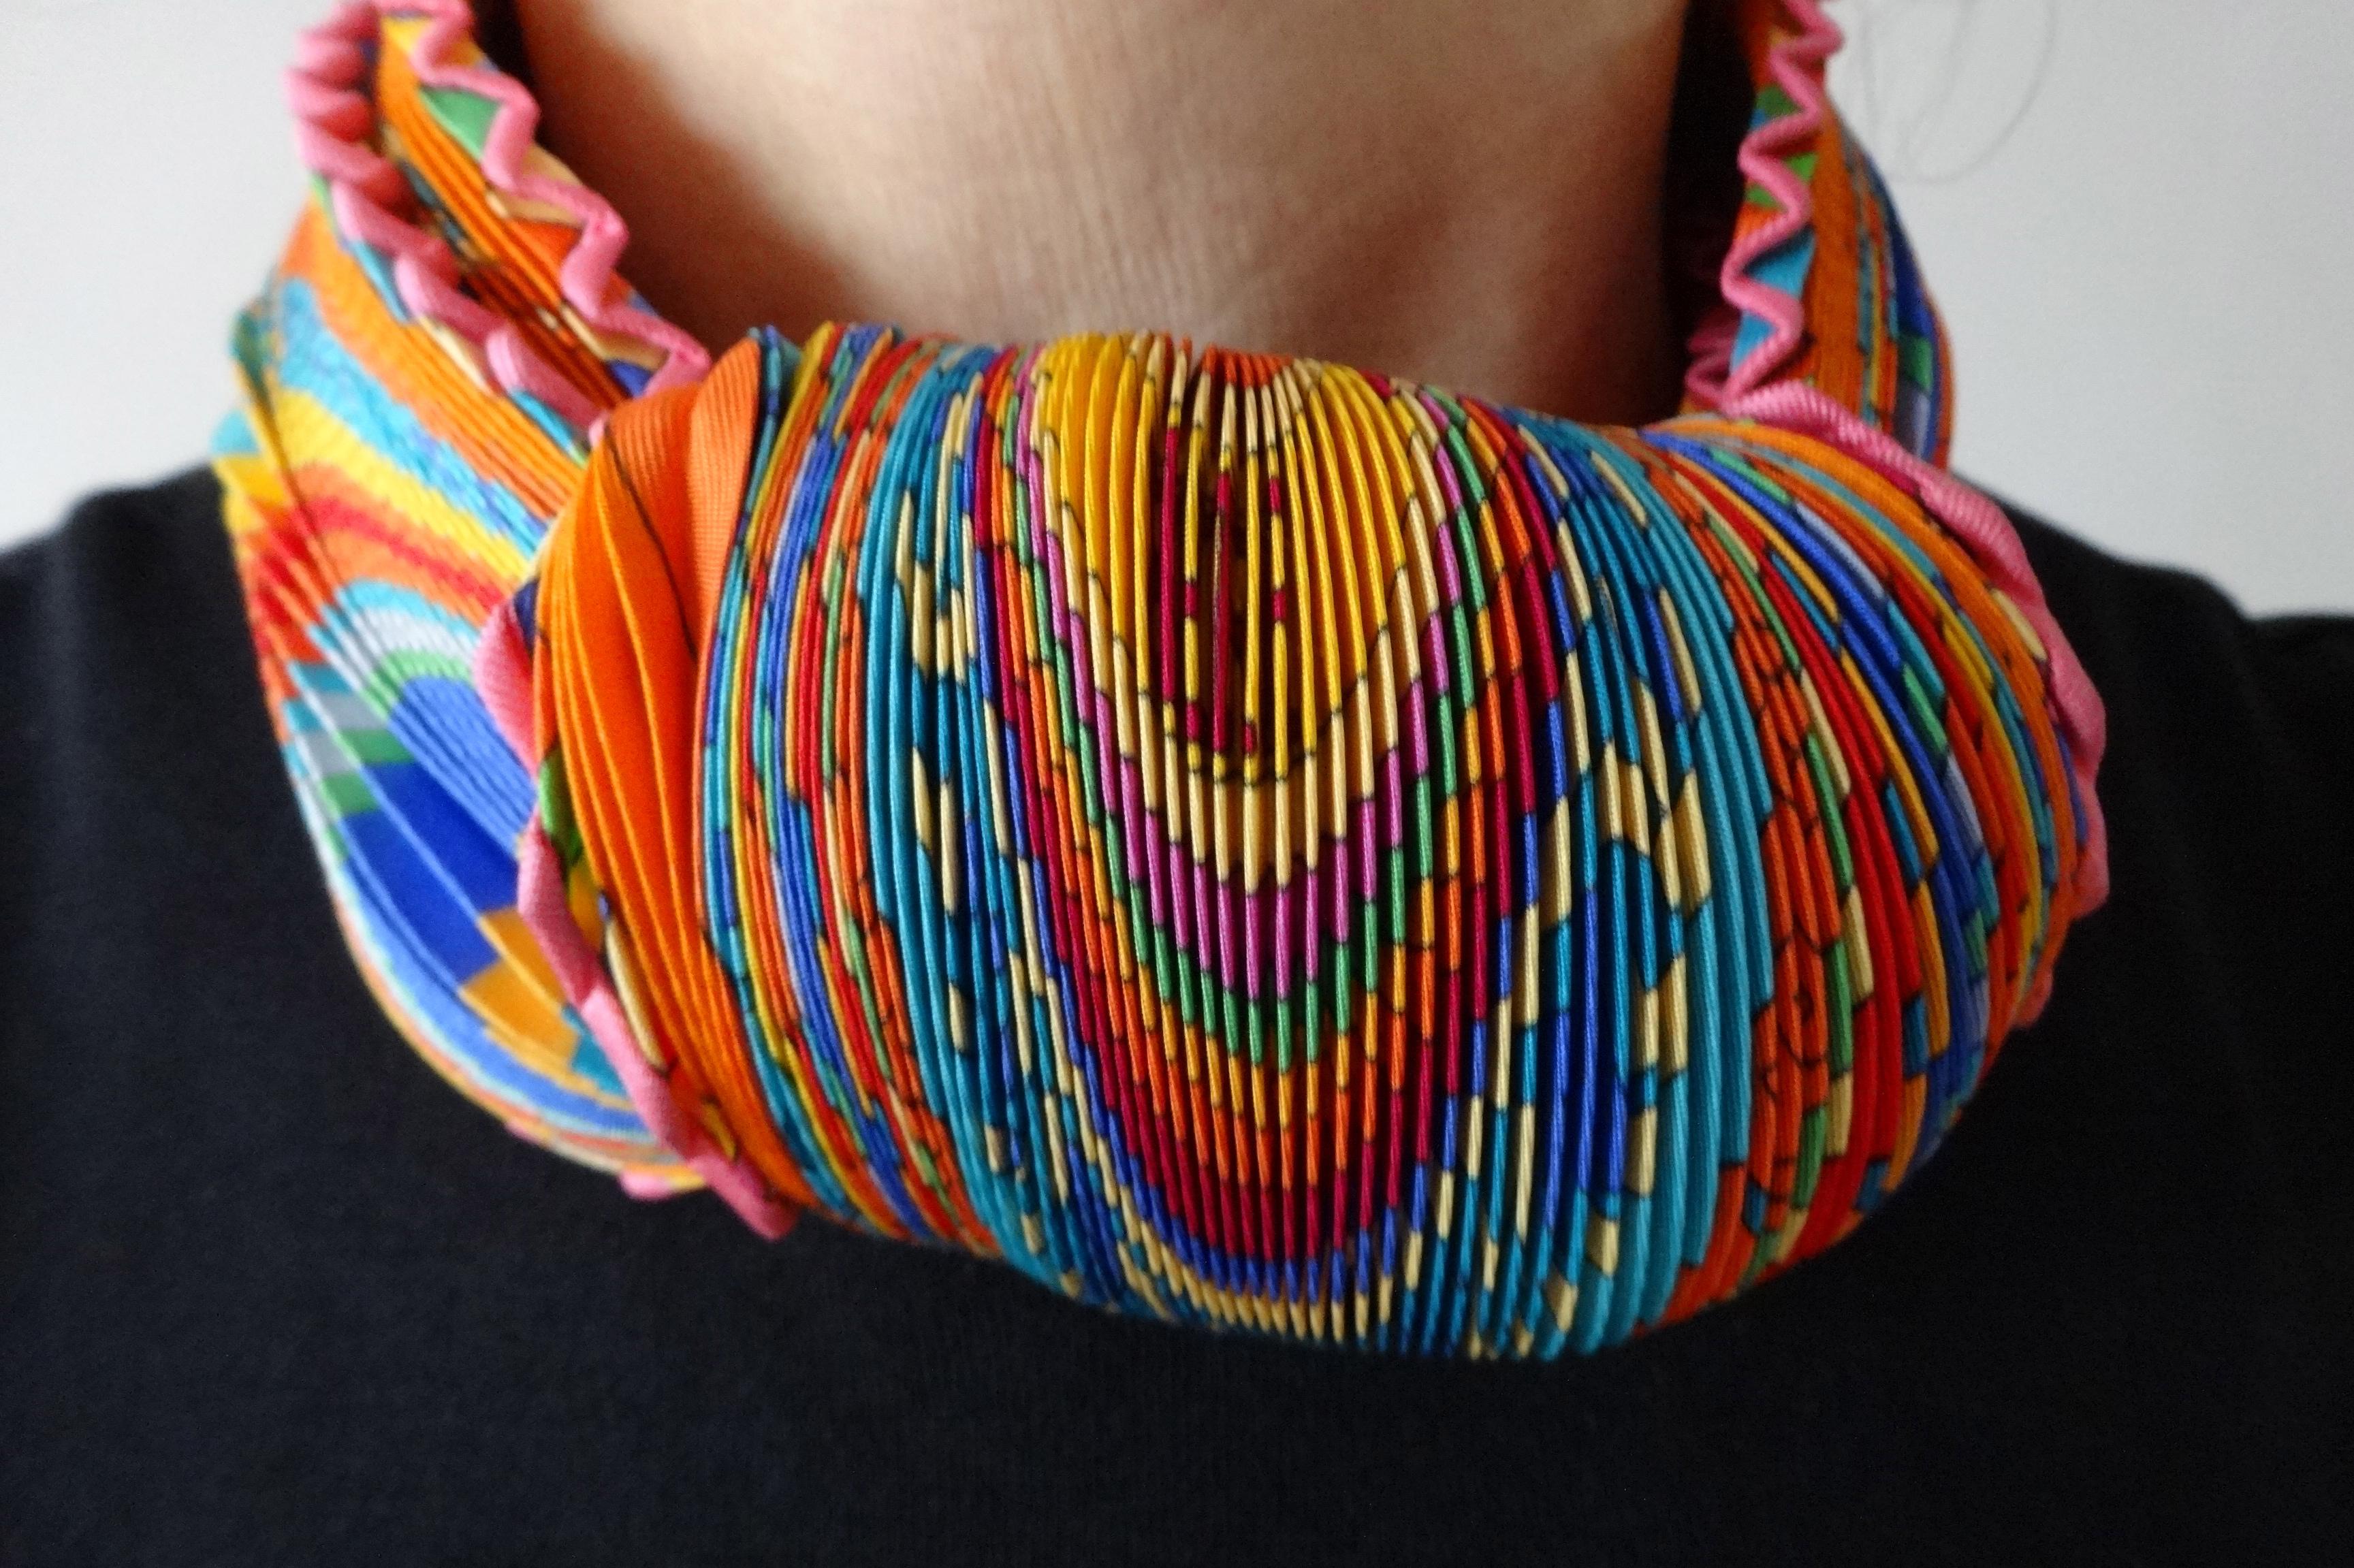 Tied with 2 knots - TohuBohu - mit 2 Knoten